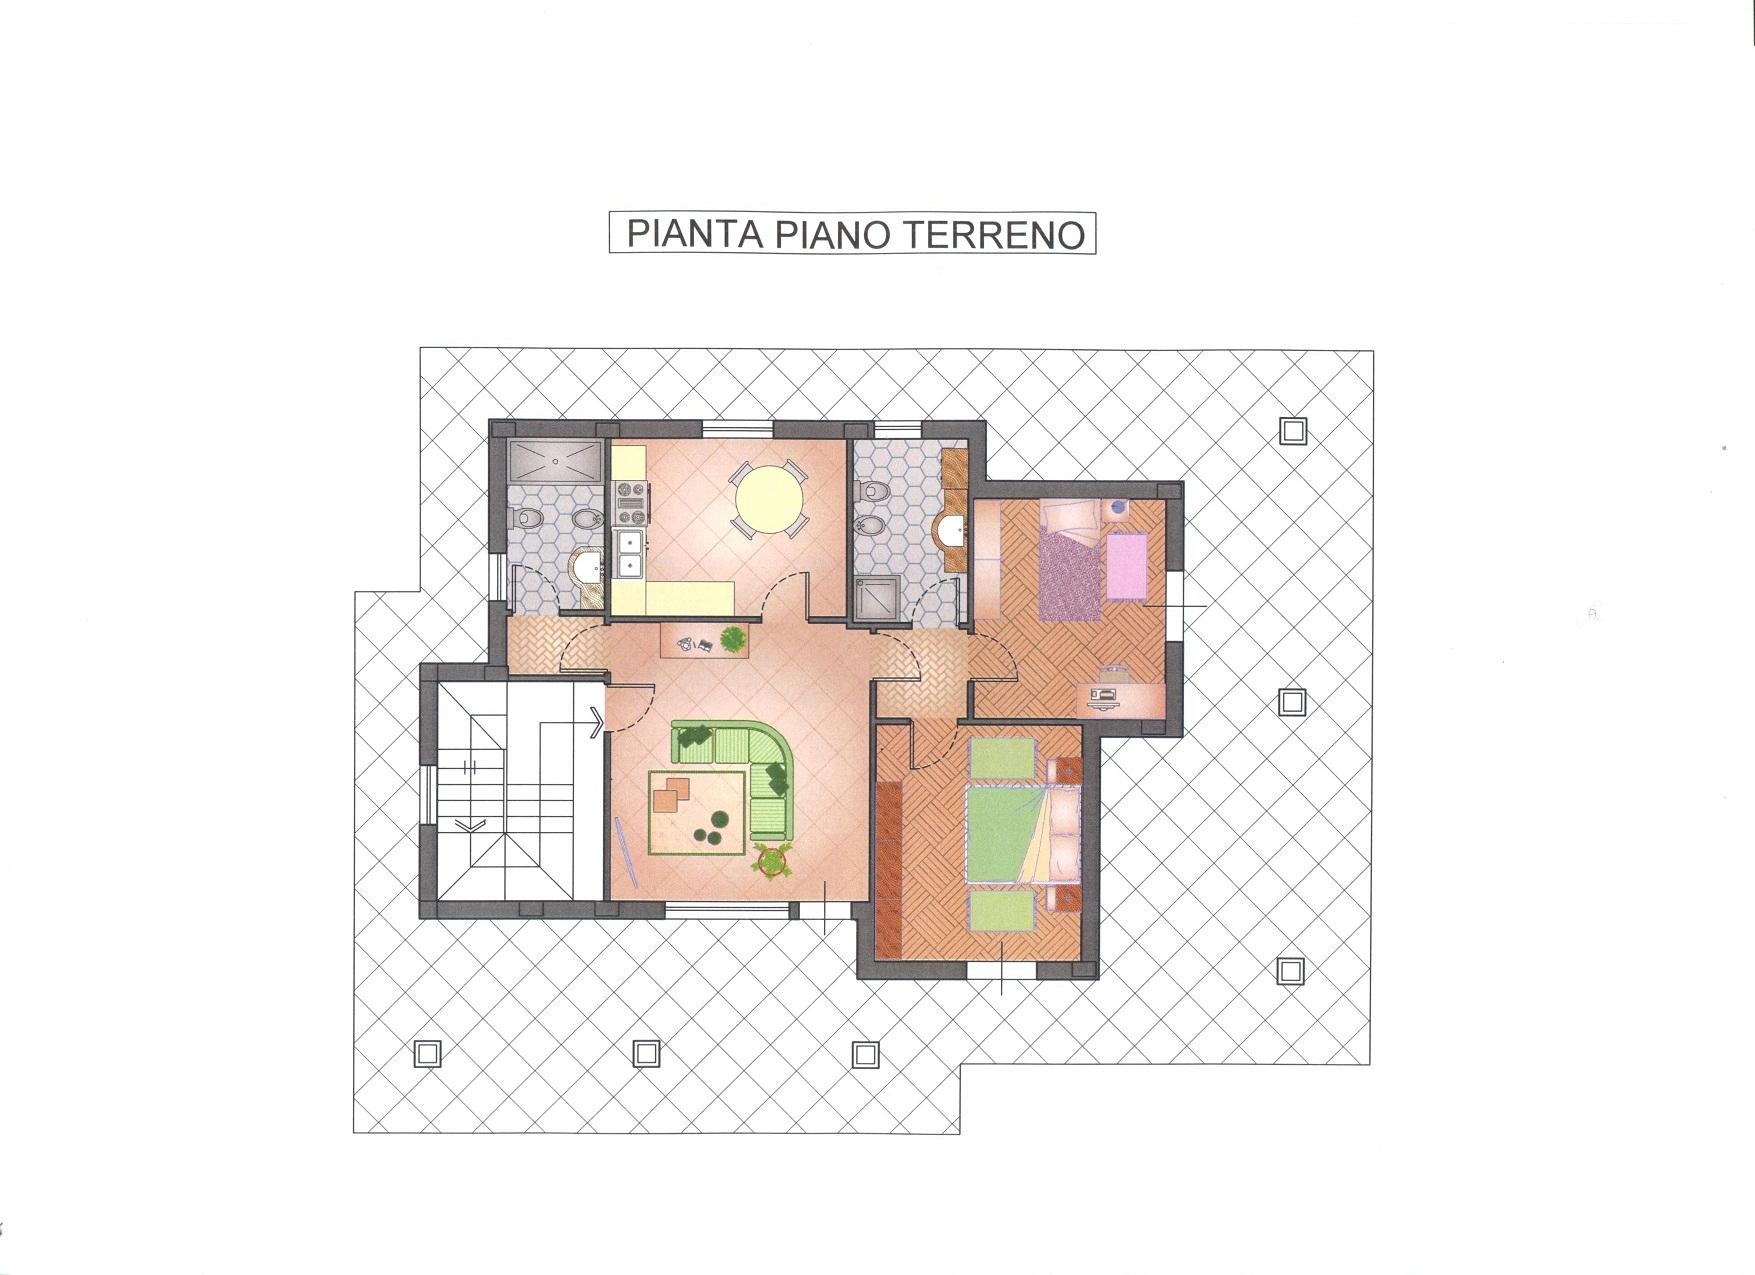 villetta 001 (2)